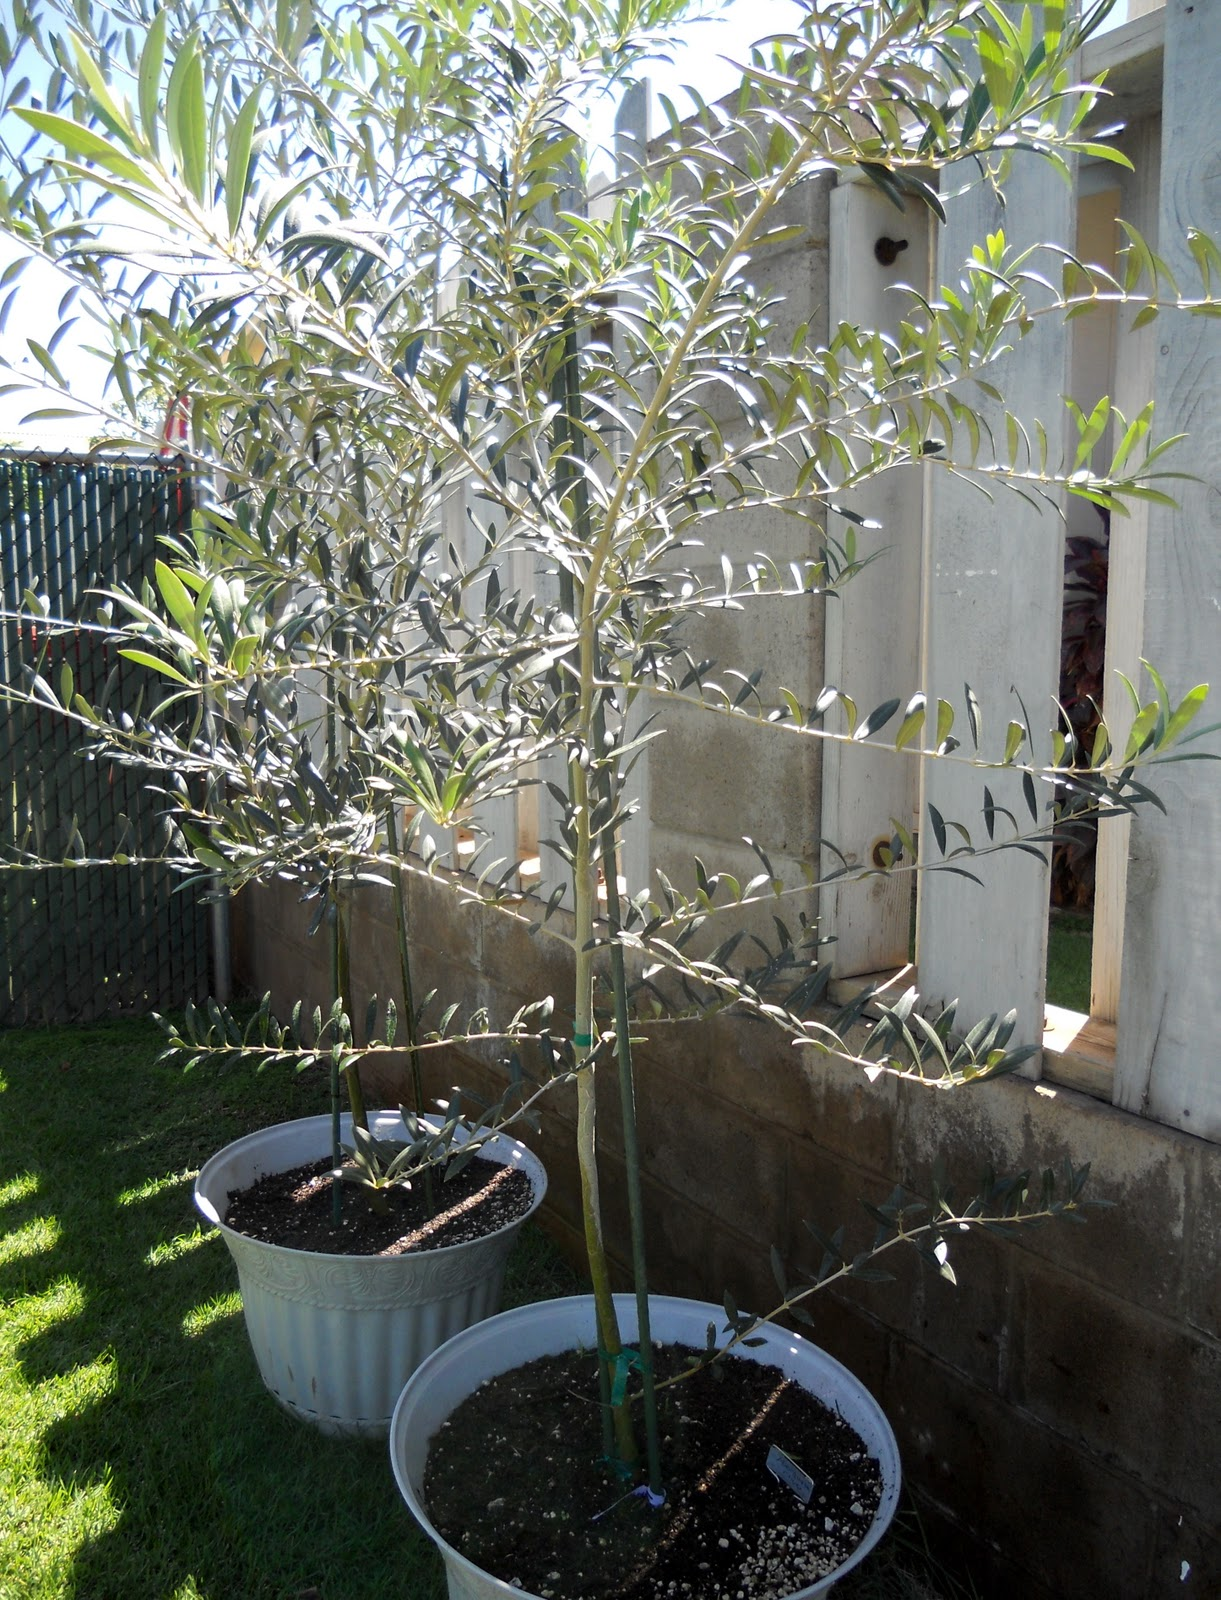 A Kitchen Garden in Kihei Maui Growing Container Fruit Trees in Kihei